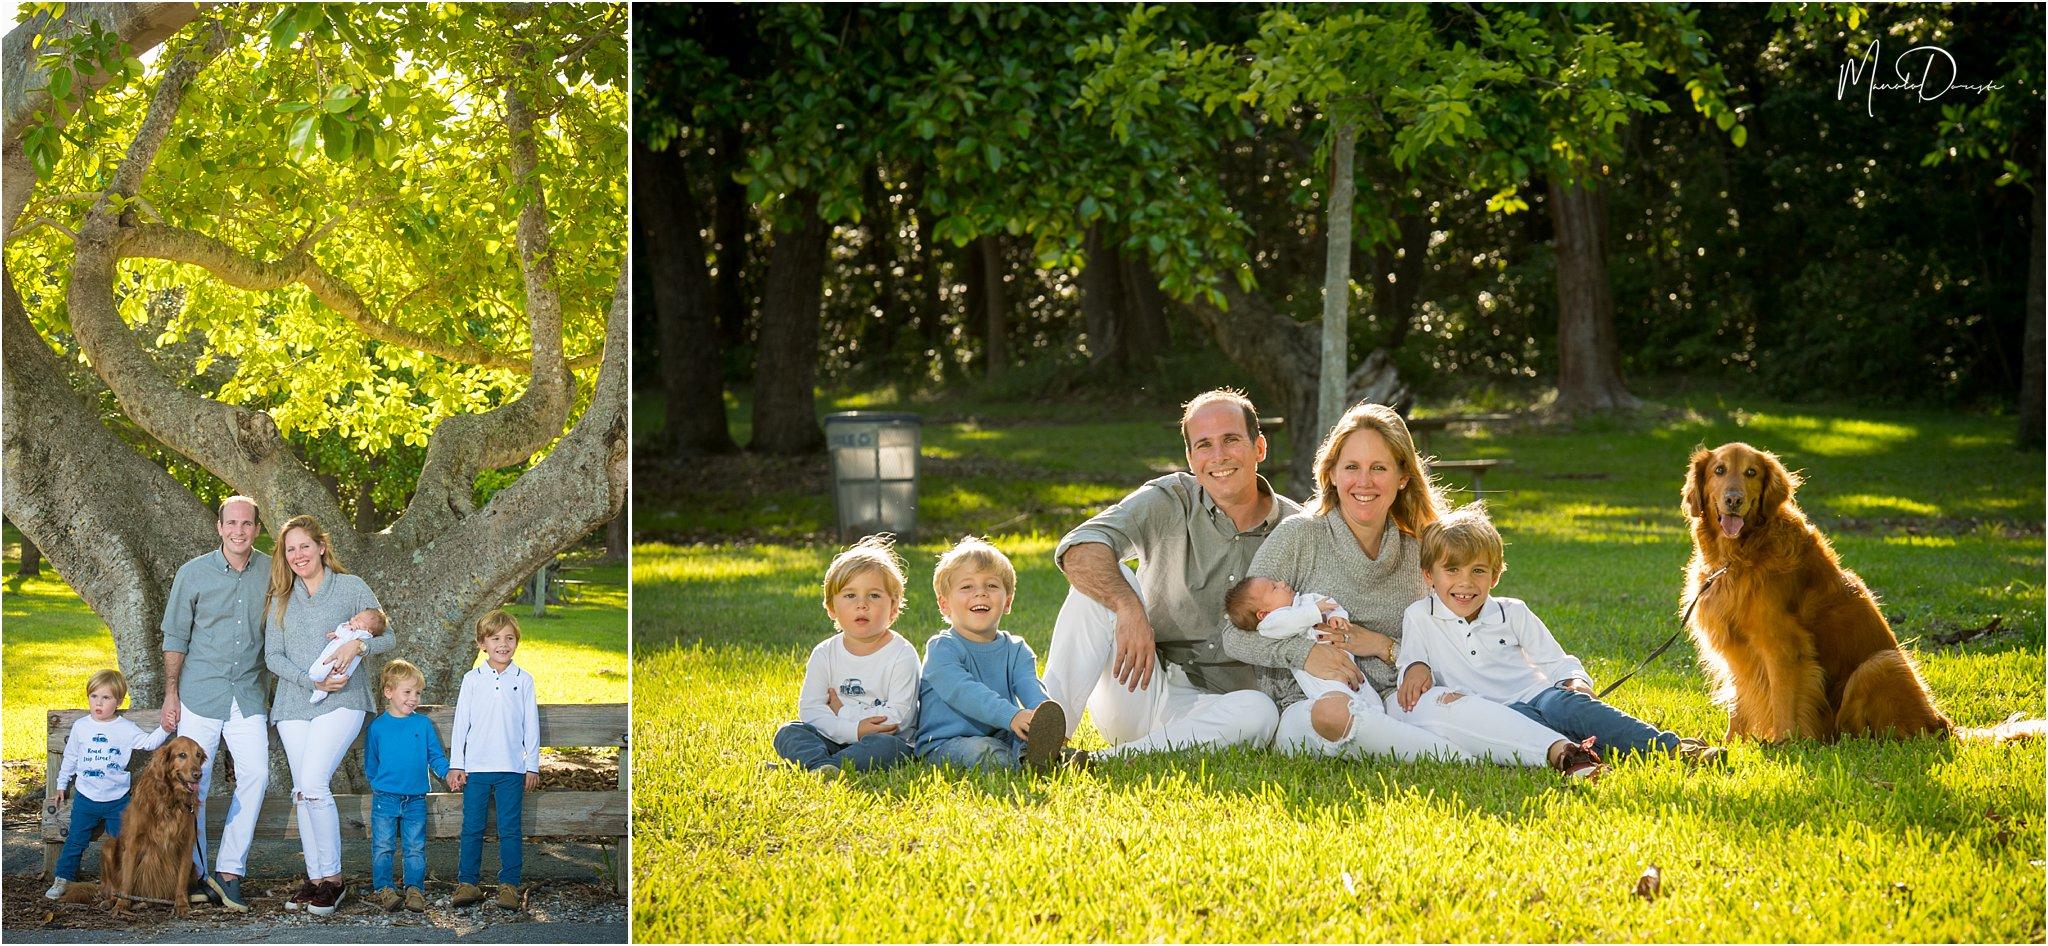 0102_ManoloDoreste_InFocusStudios_Wedding_Family_Photography_Miami_MiamiPhotographer.jpg